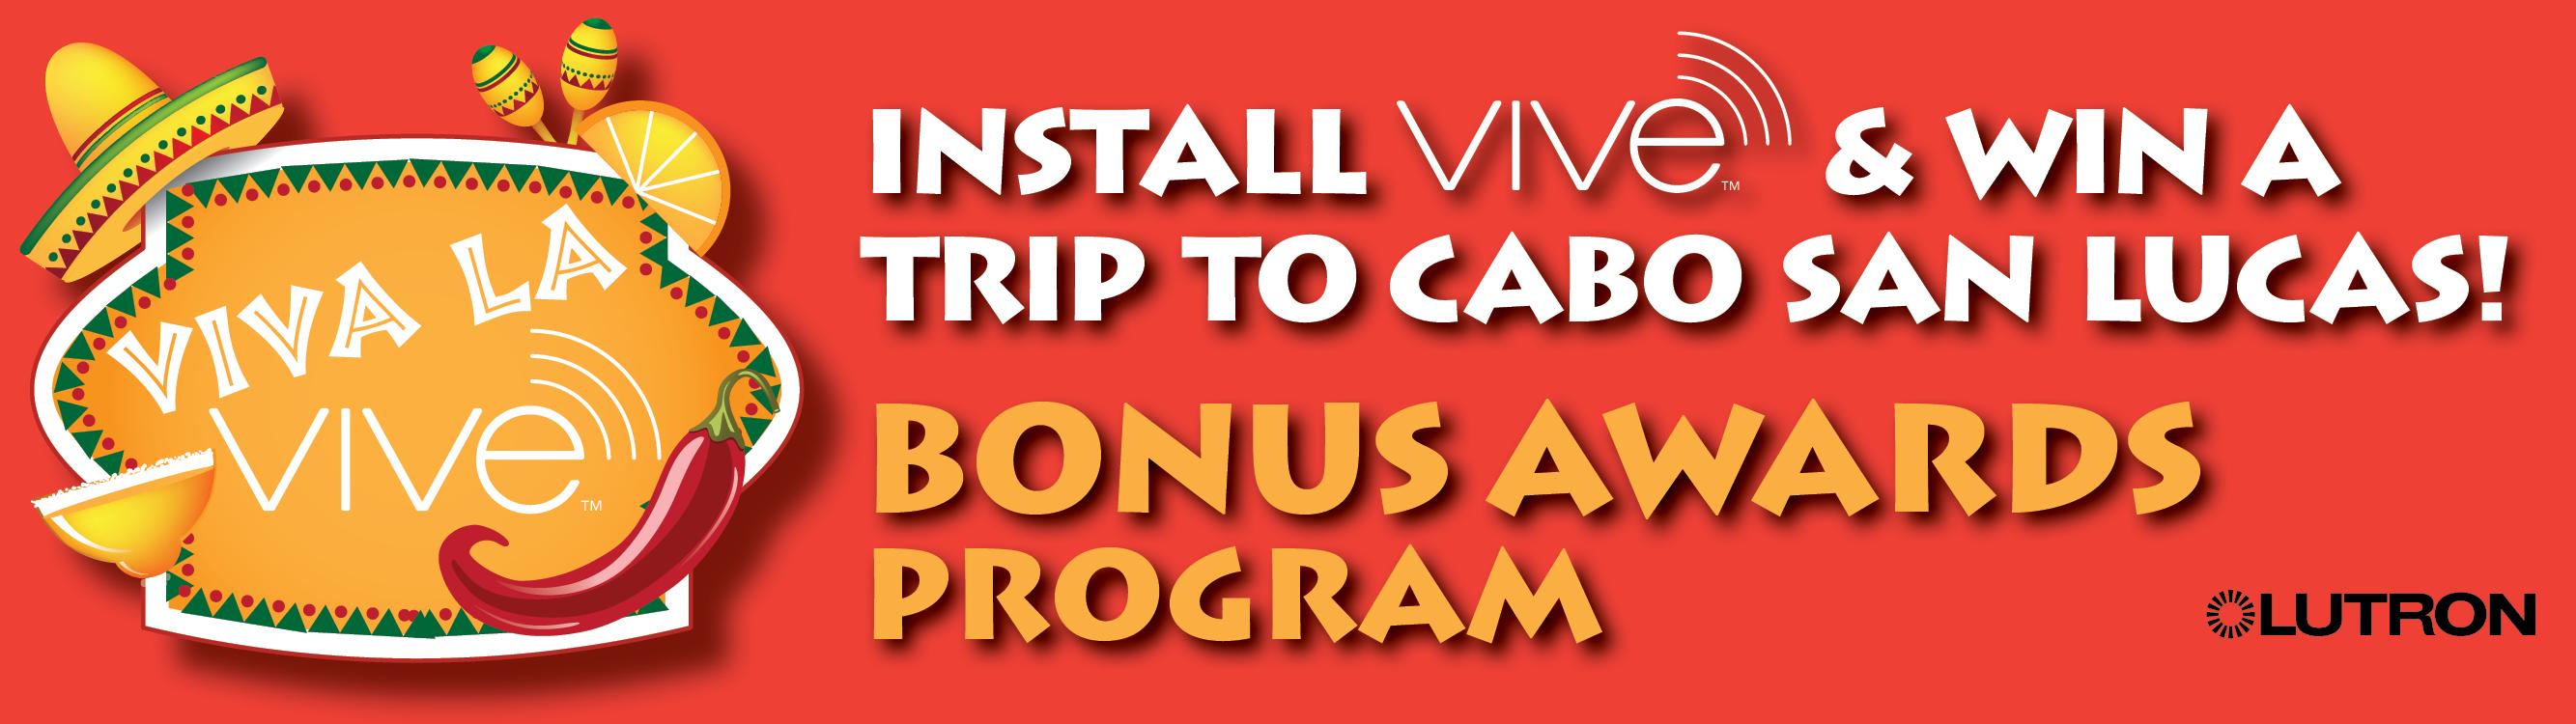 Viva-la-Vive-Email-Bonus-header.png